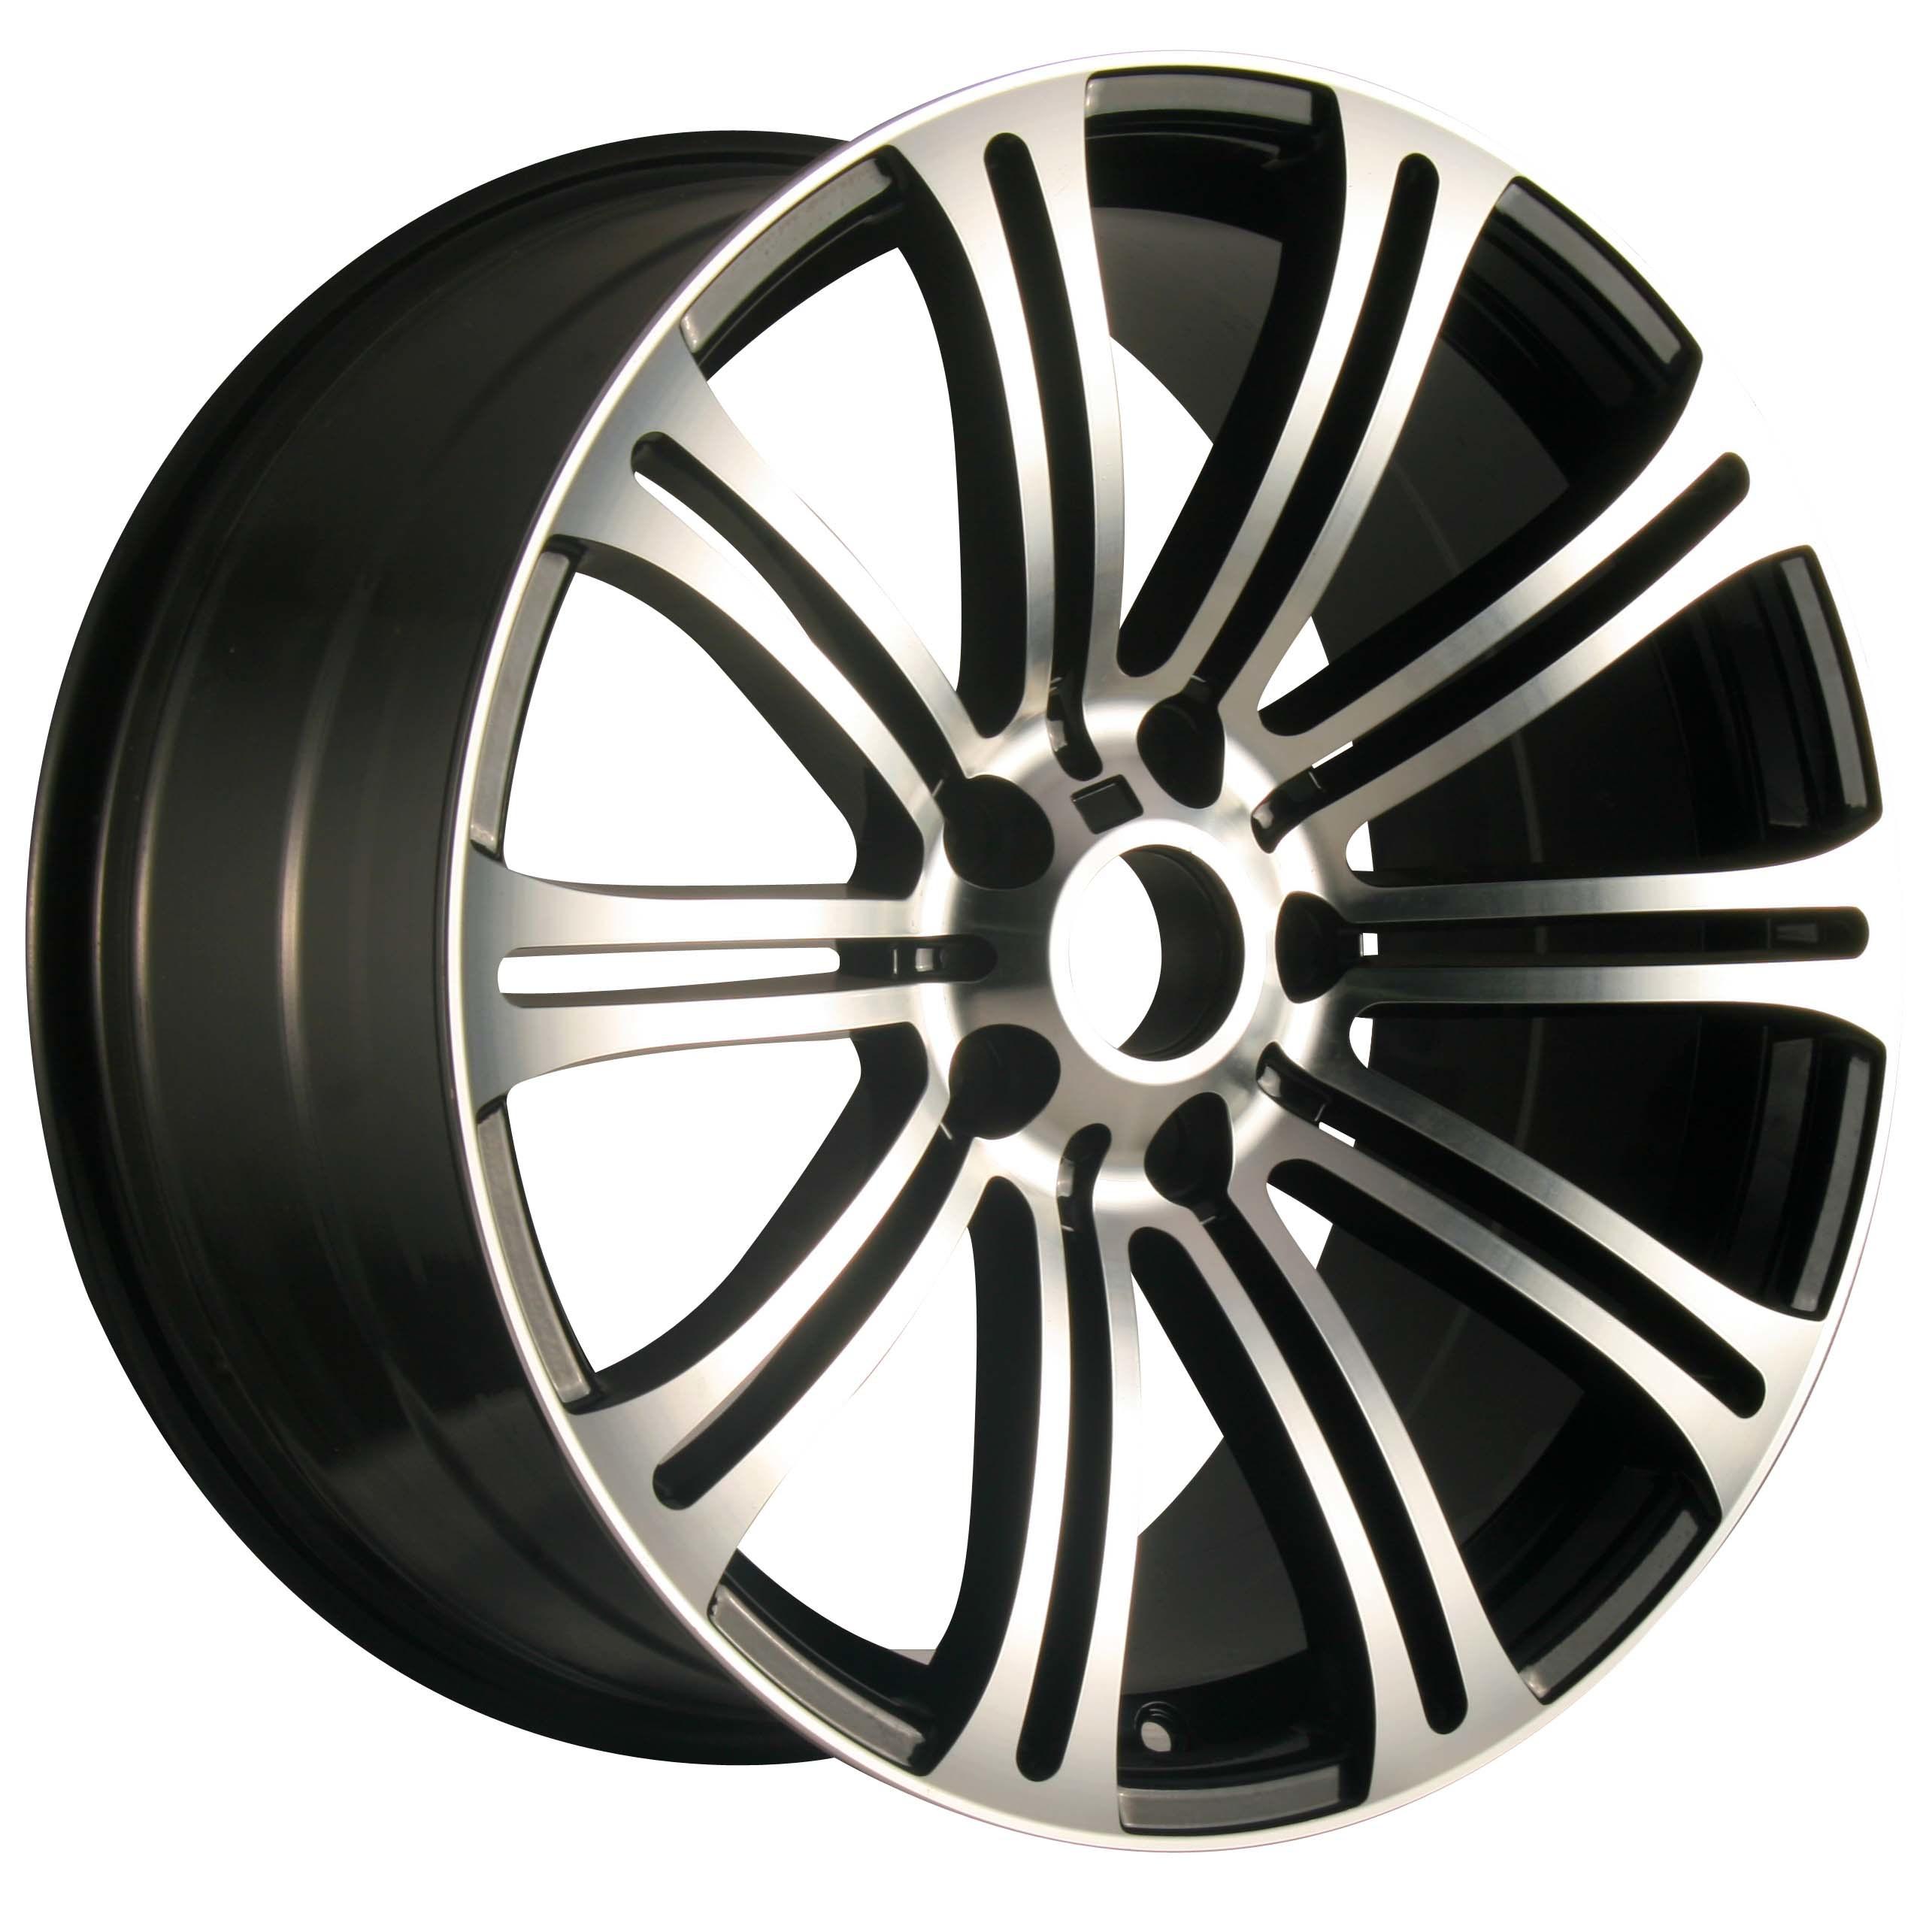 13inch Alloy Wheel Replica Wheel for Bmw′s